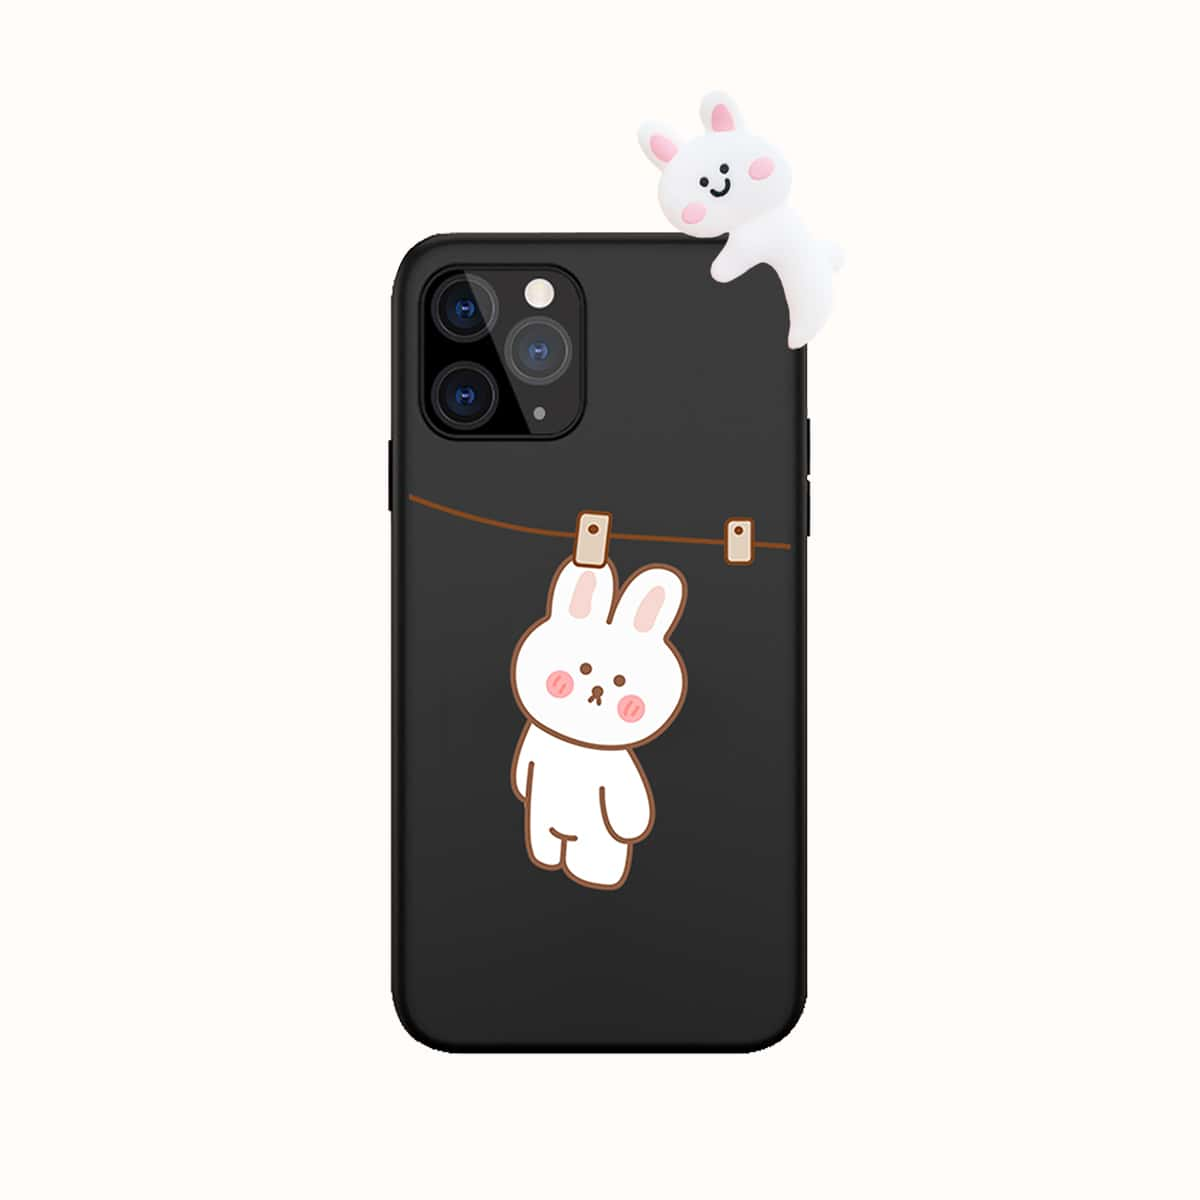 3D Rabbit Decor Cartoon Graphic Phone Case